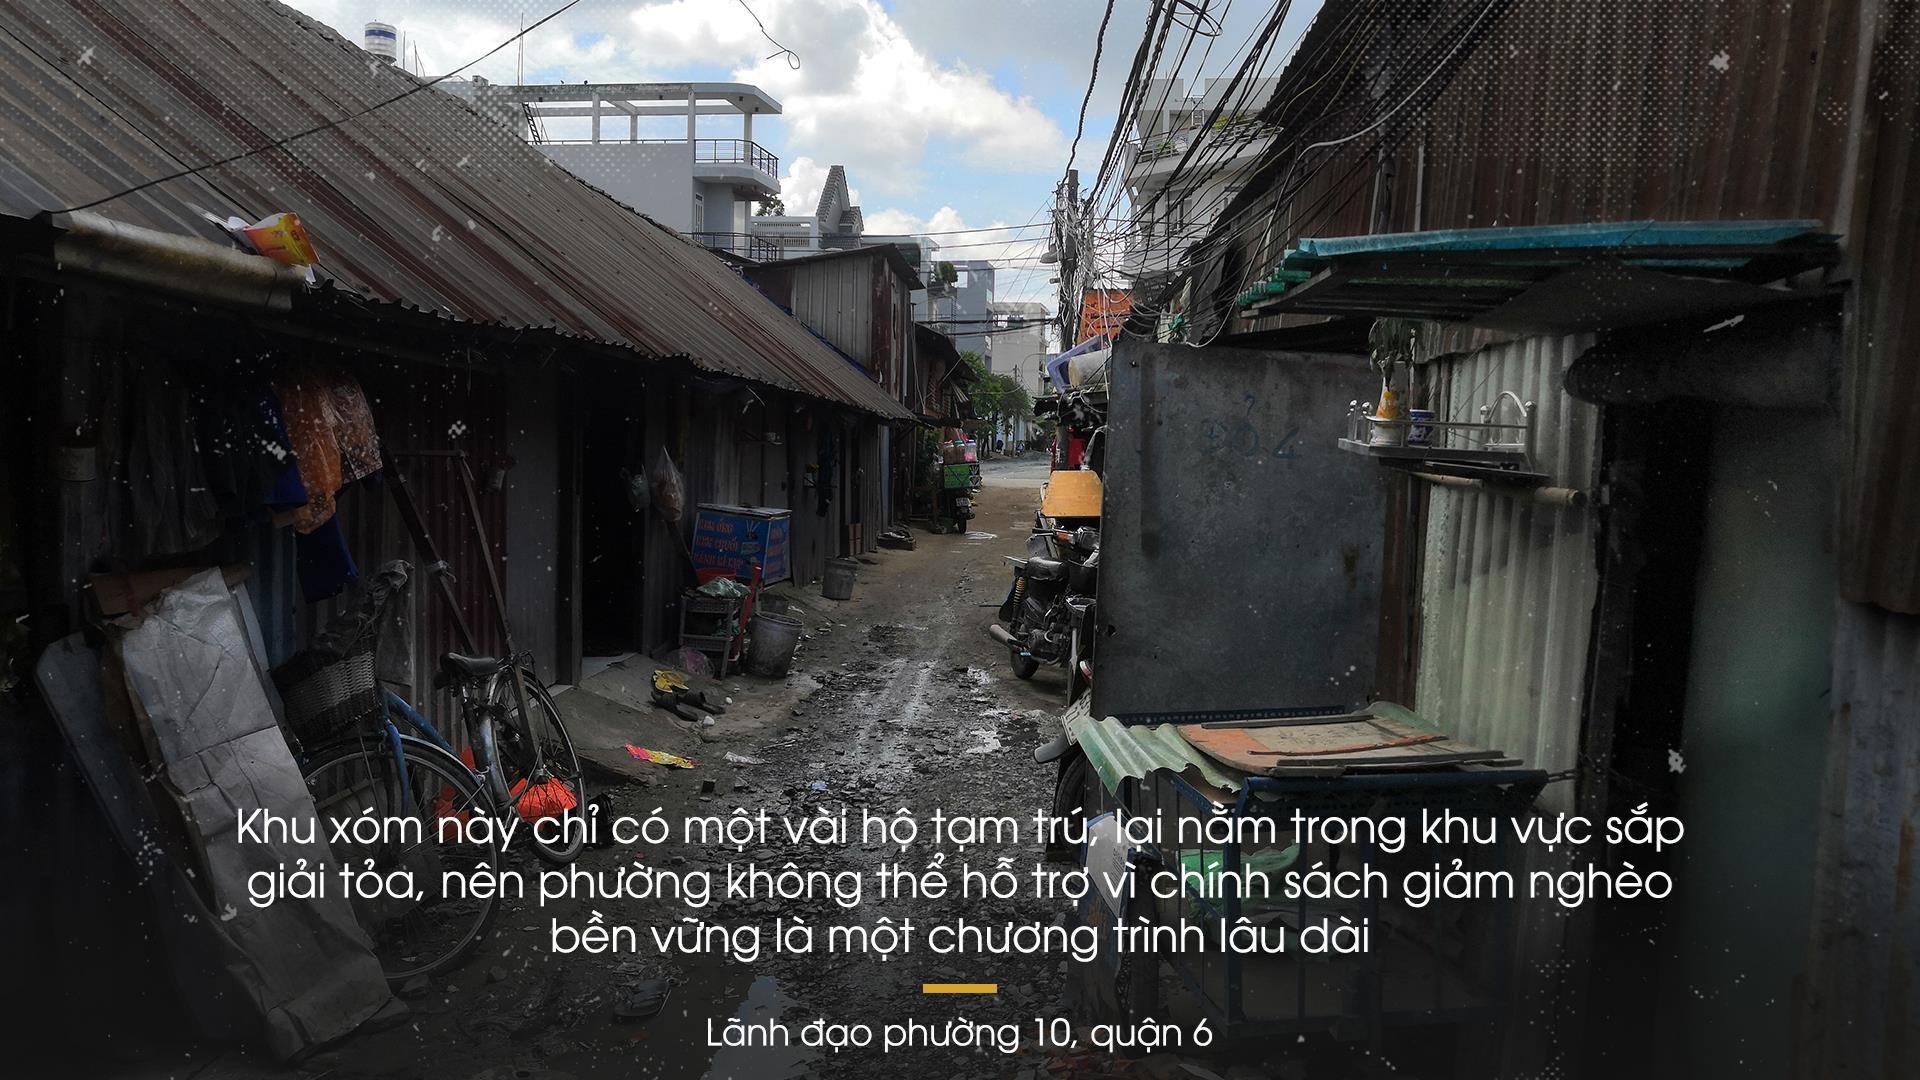 Nhung phan nguoi Sai Gon mac ket sau 27 nam giam ngheo hinh anh 5